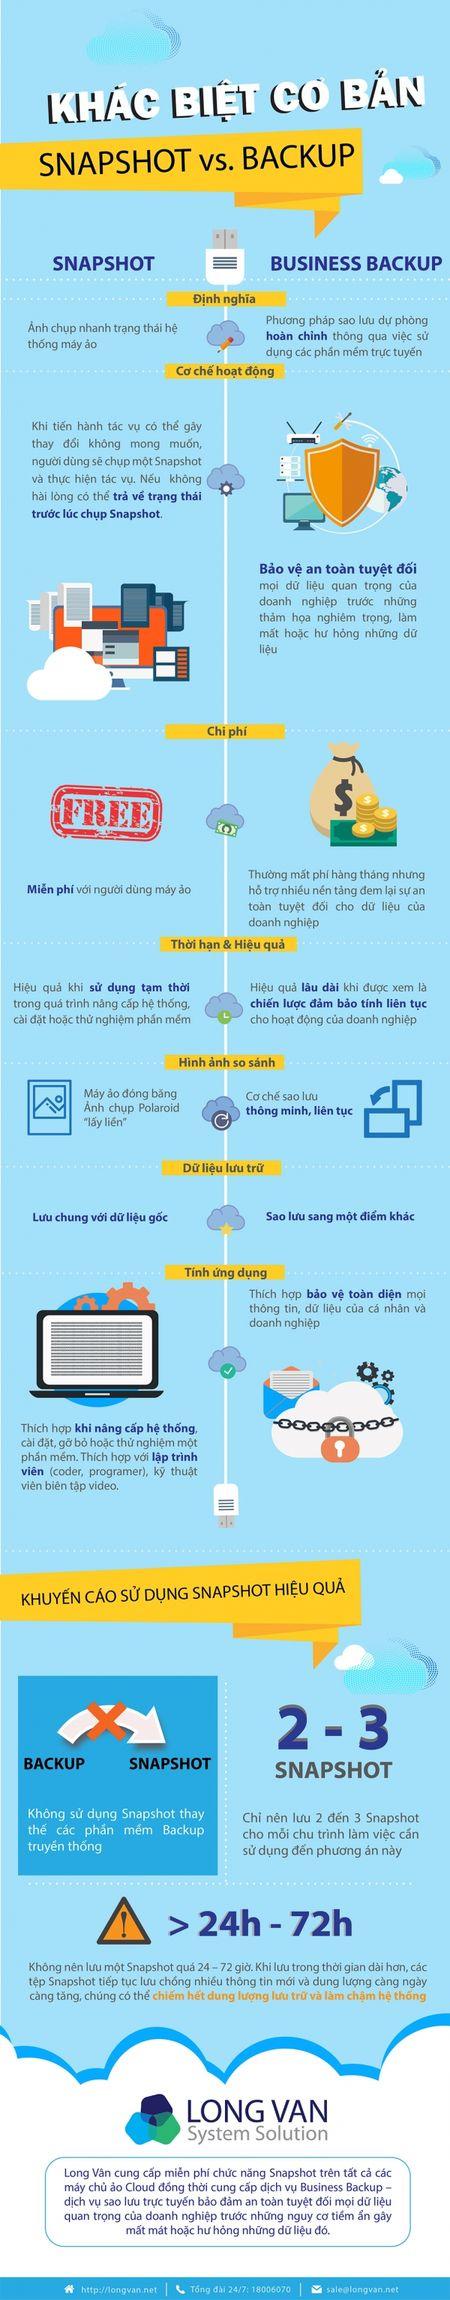 [Infographic] Snapshot va Backup: Dau la su khac biet trong quan ly co so du lieu - Anh 1